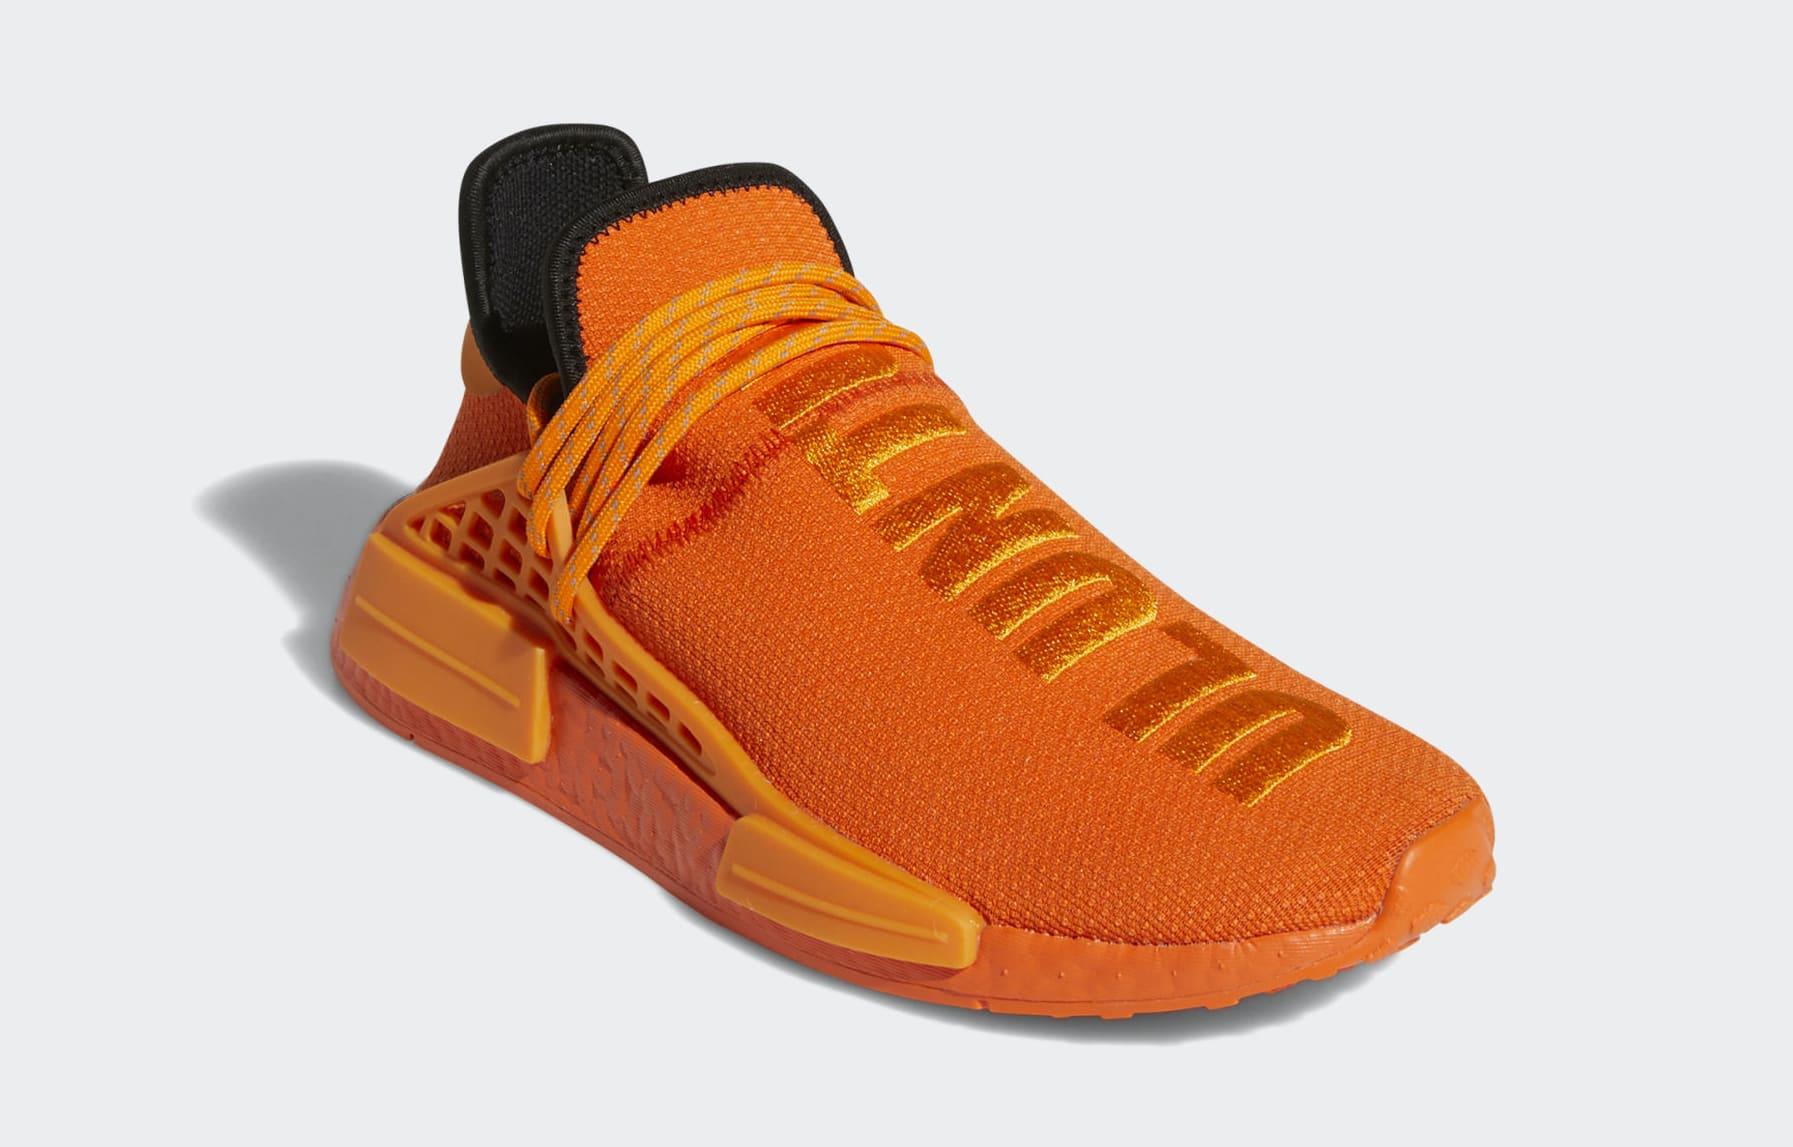 Pharrell x Adidas NMD Hu Orange GY0095 Front